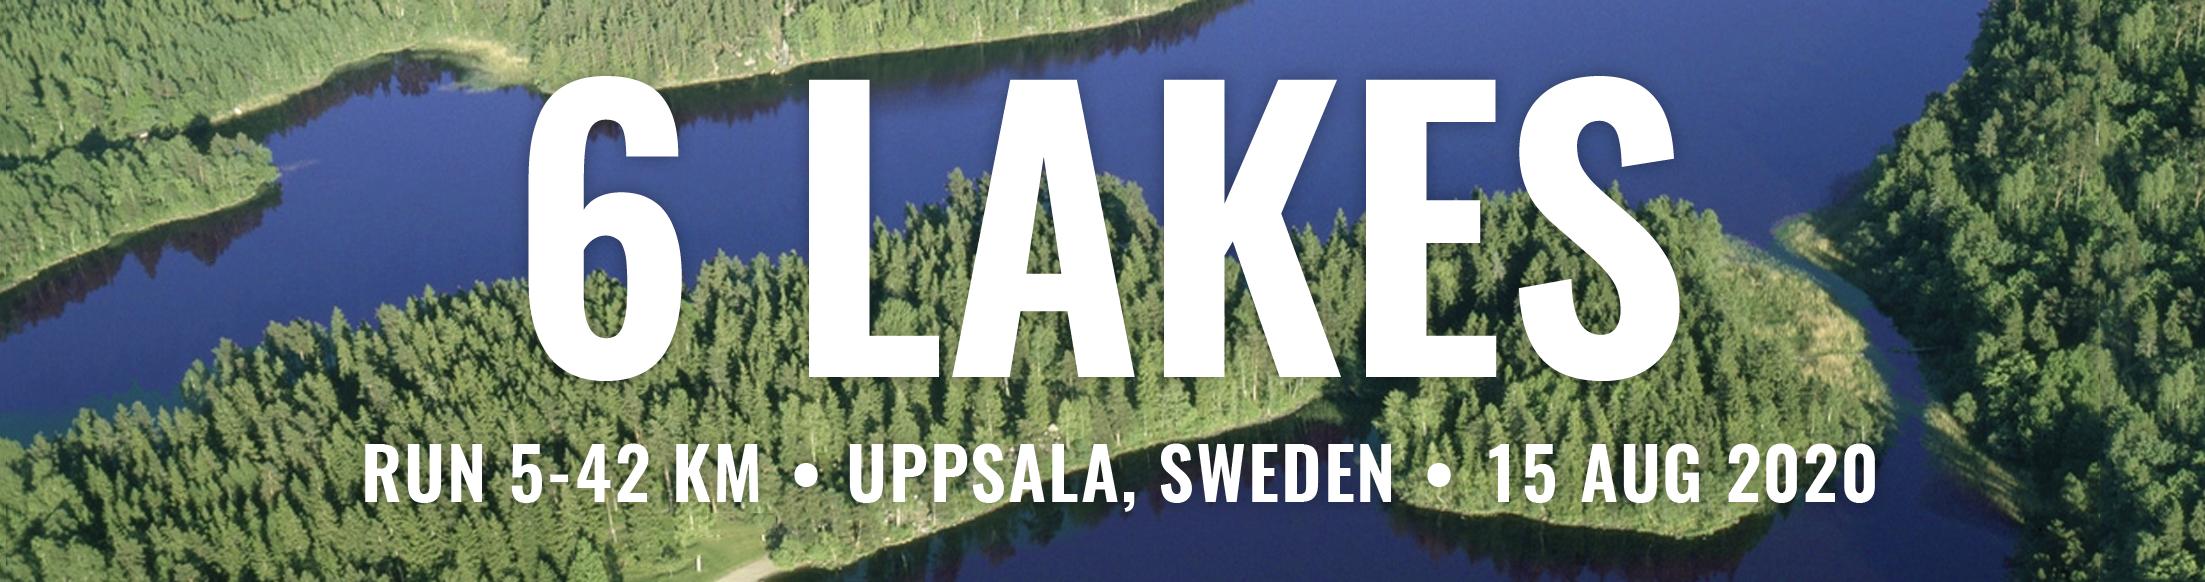 Six lakes marathon